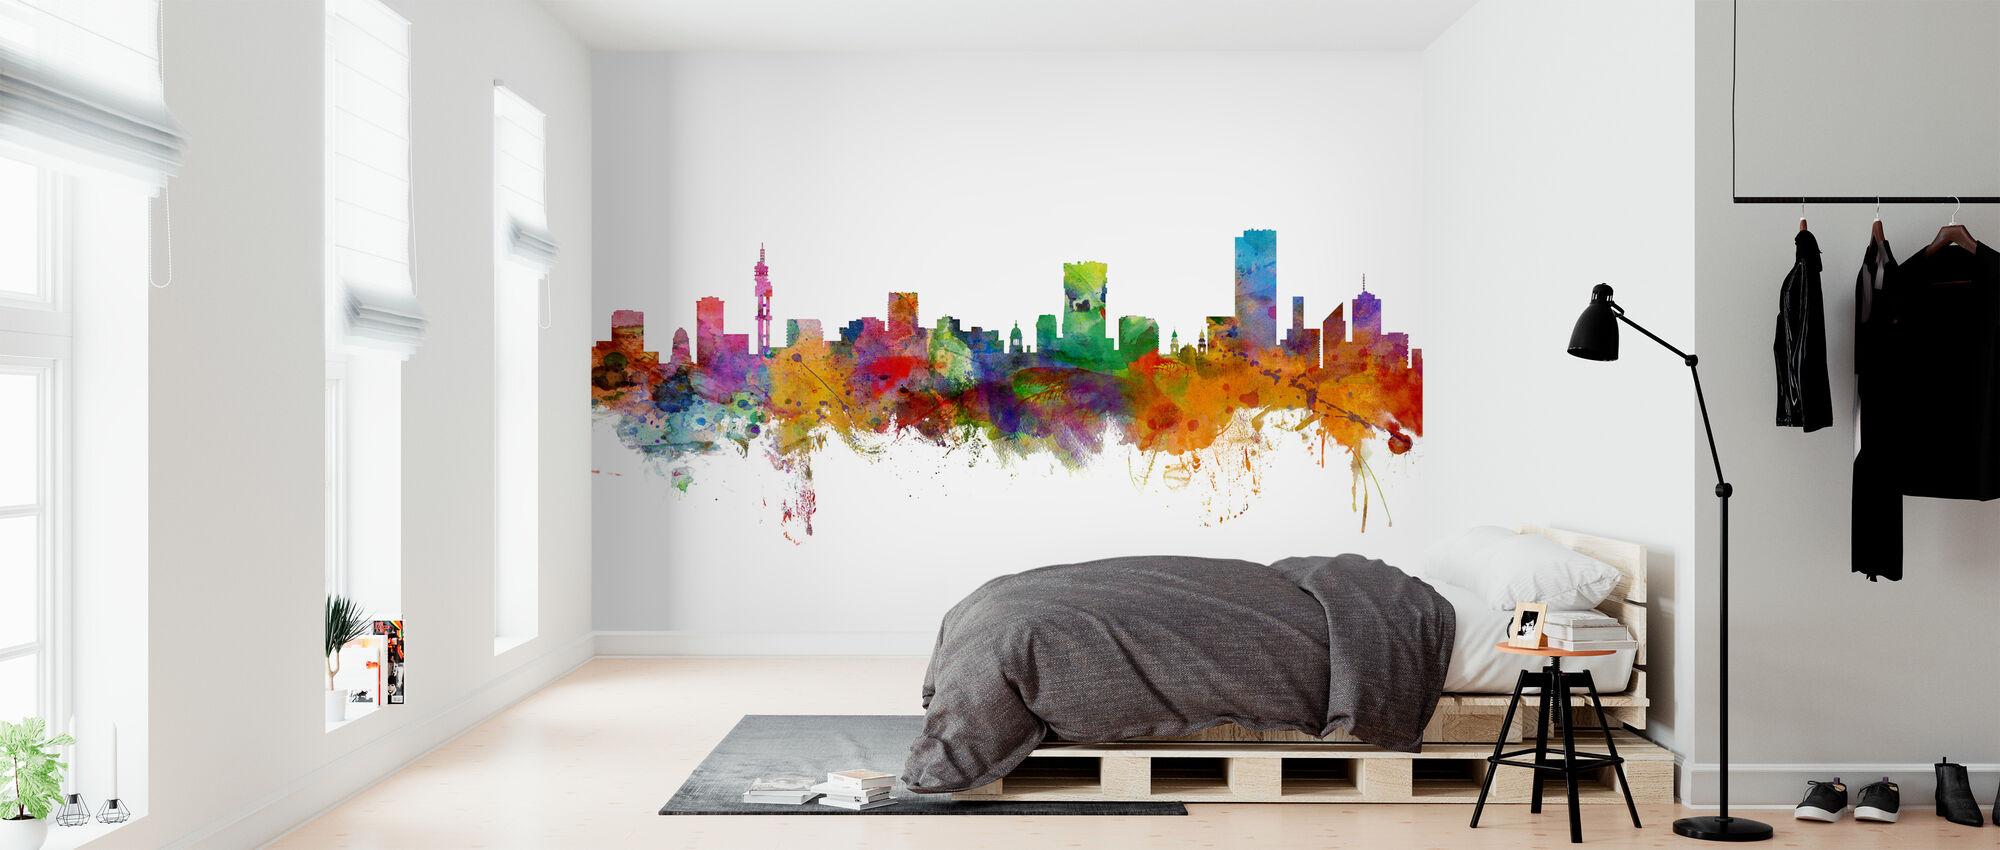 Pretoria South Africa Skyline - Wallpaper - Bedroom